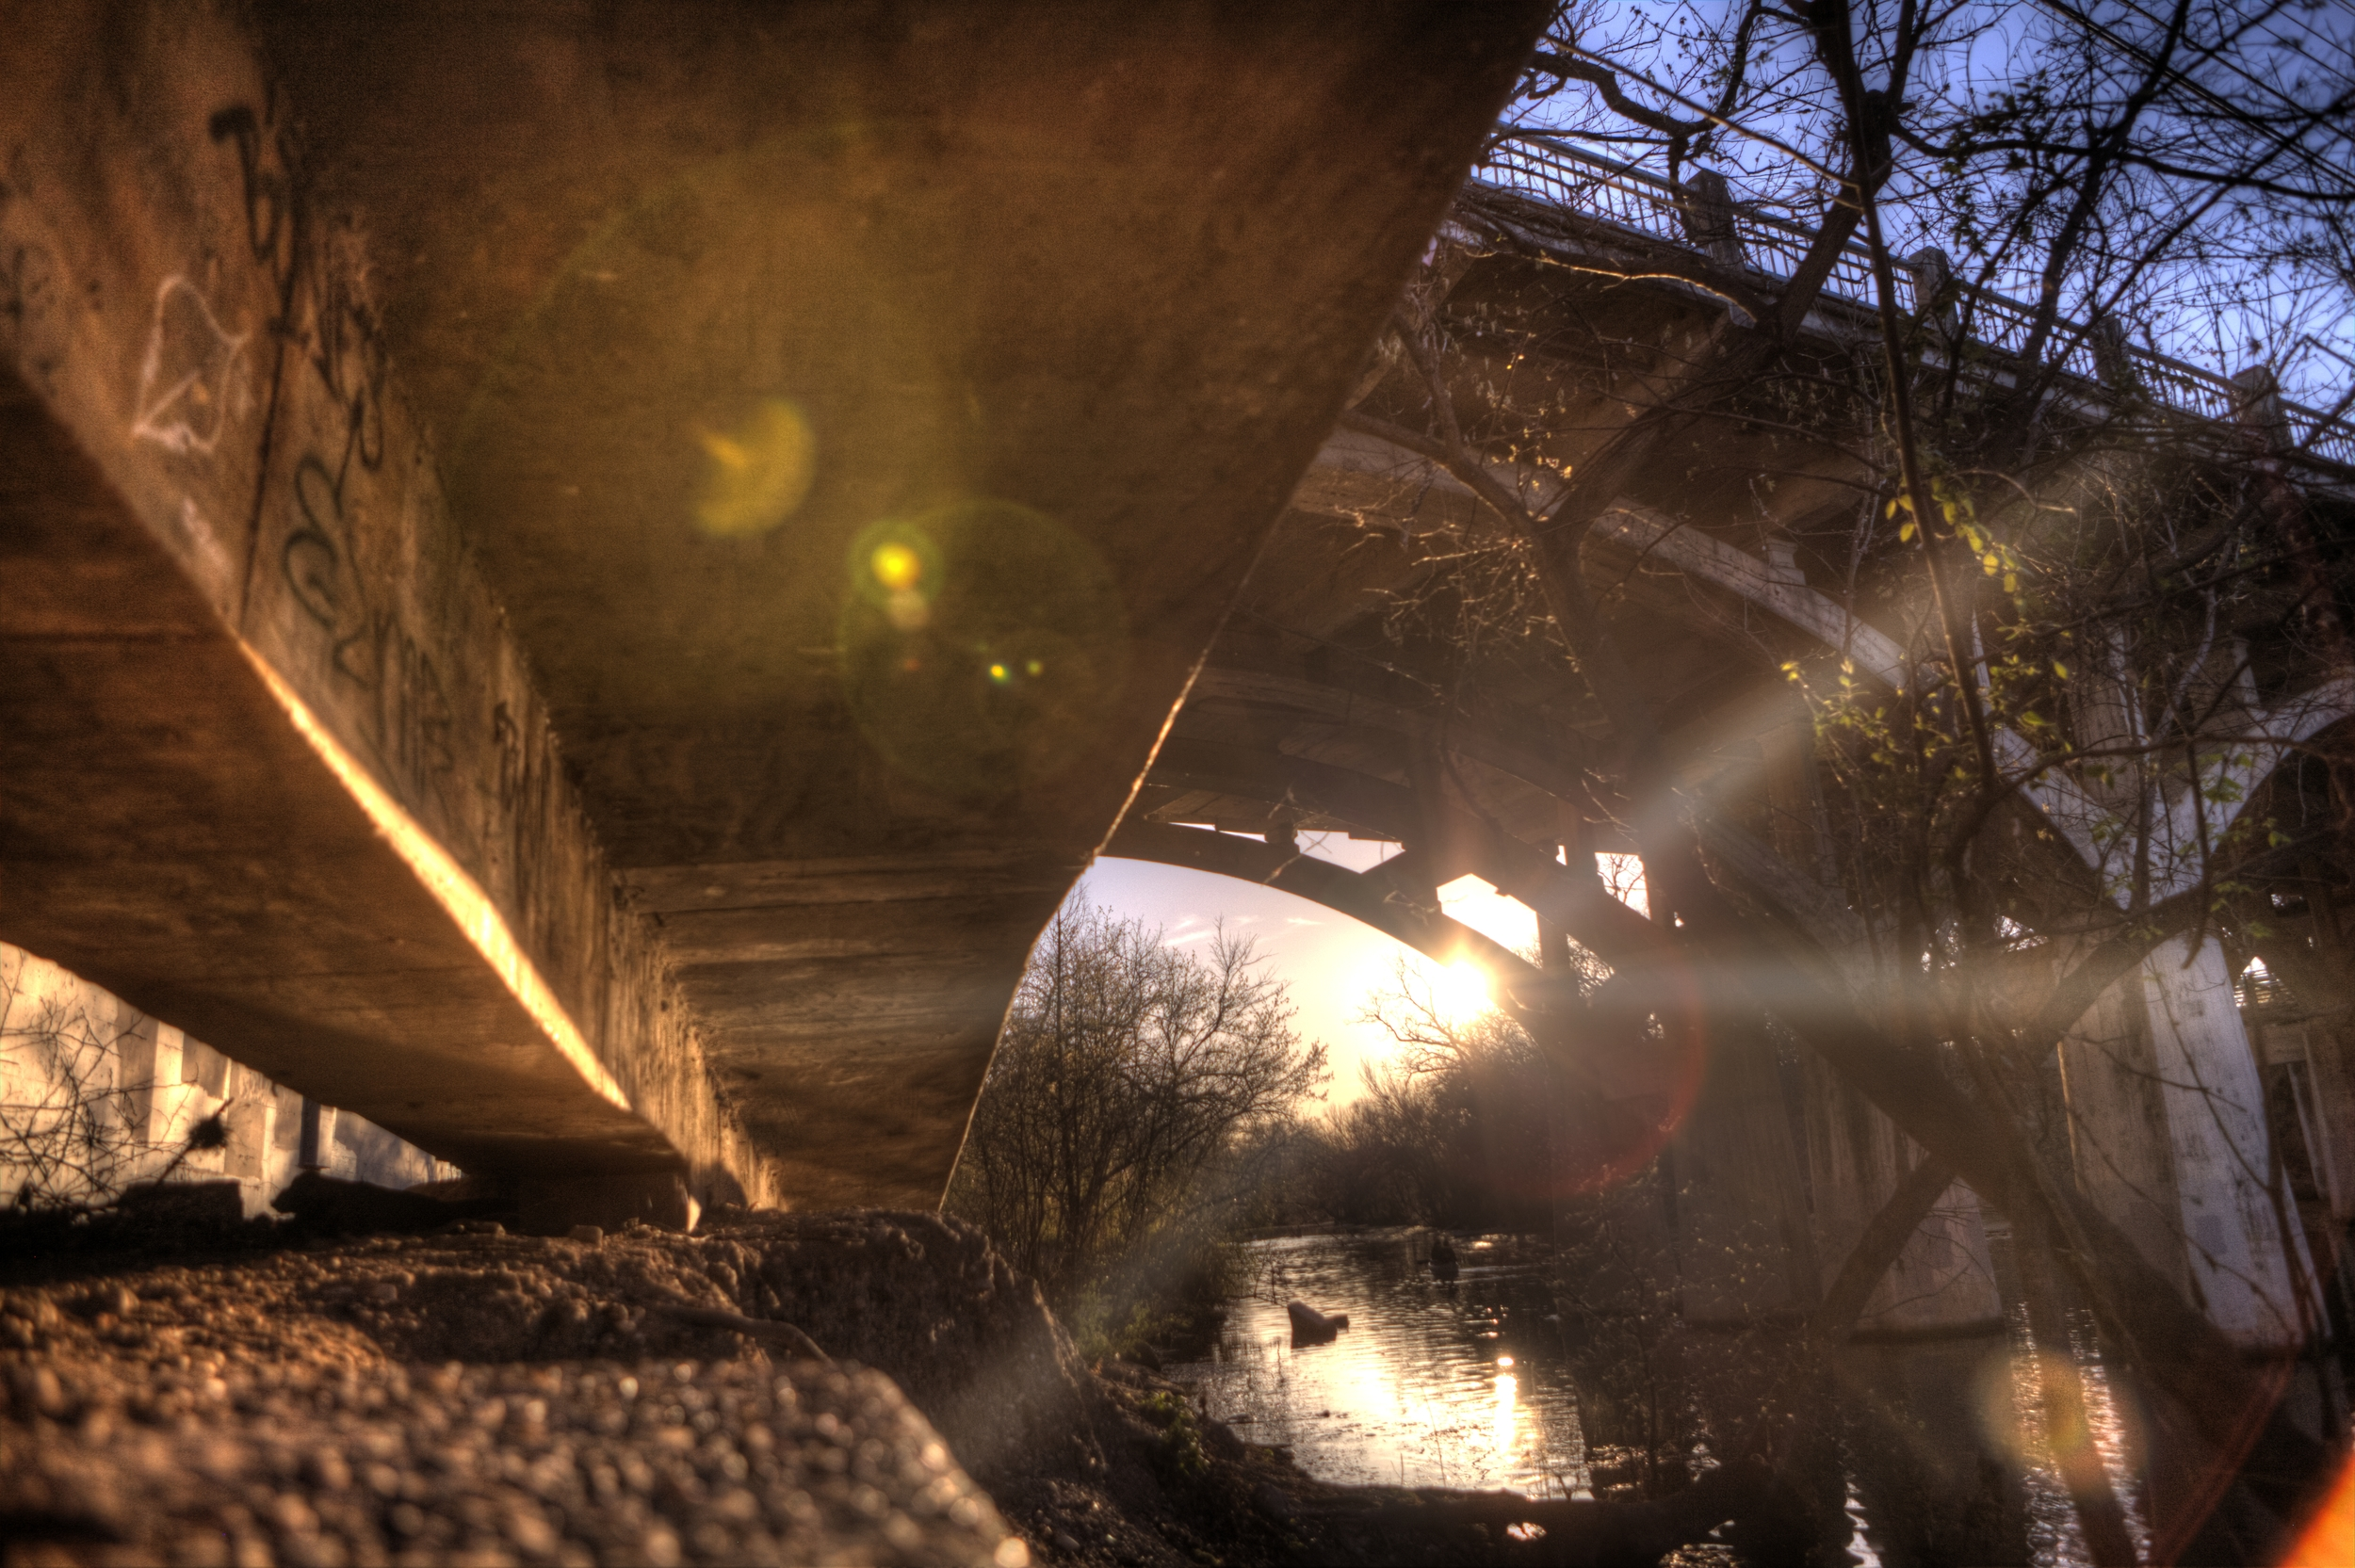 Austin Under Bridge HDR .jpg